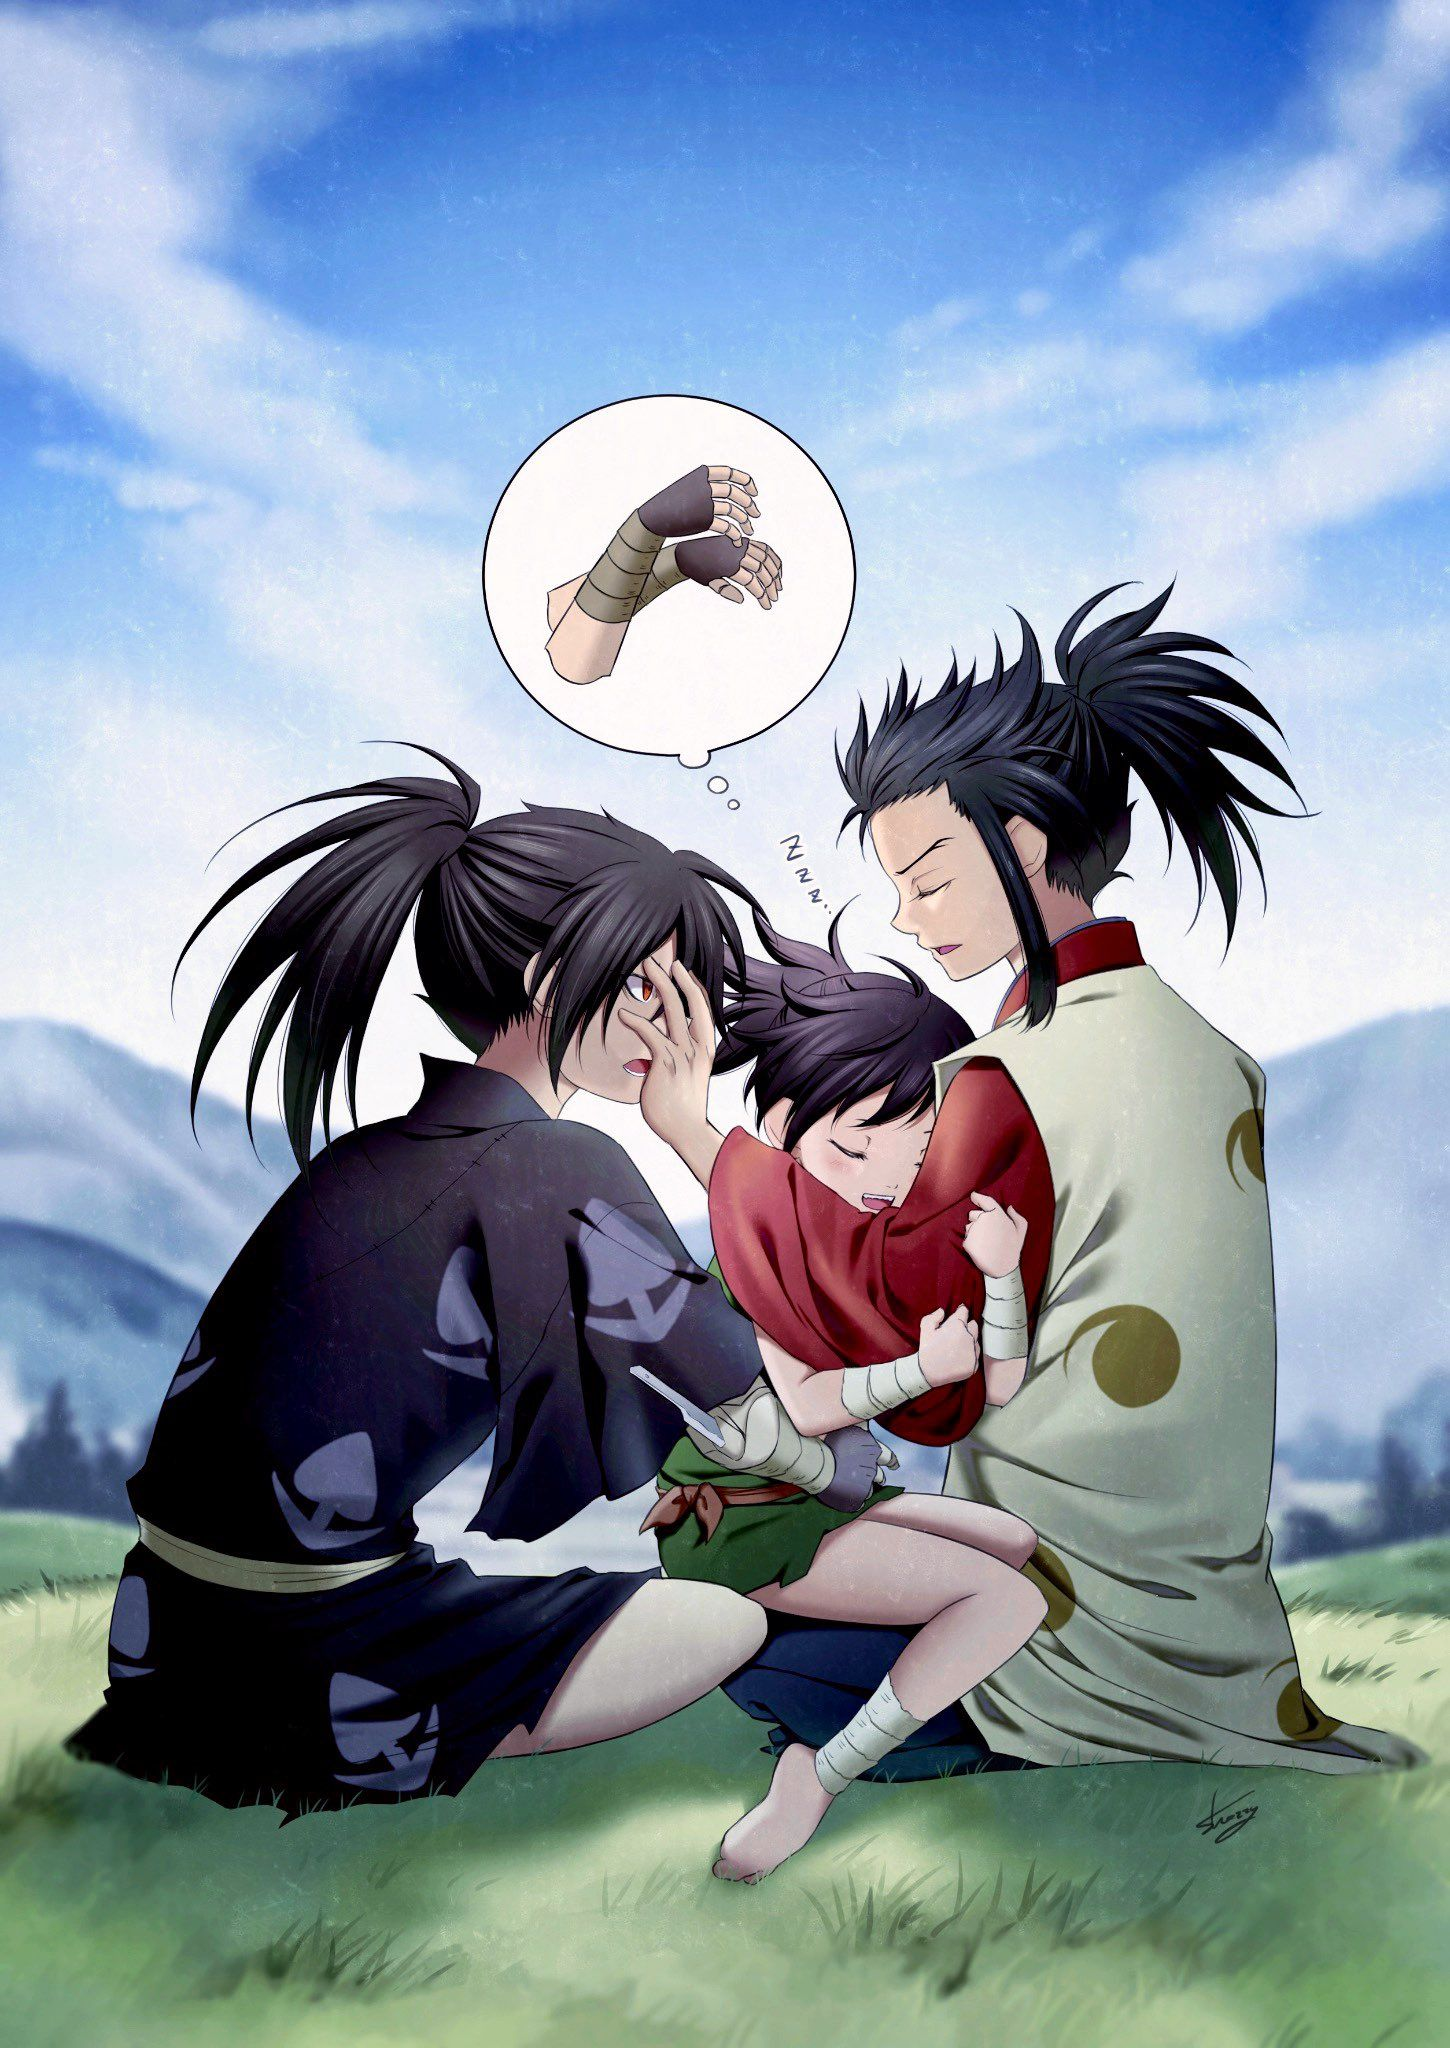 Sherry On Anime Manga Anime Anime Love